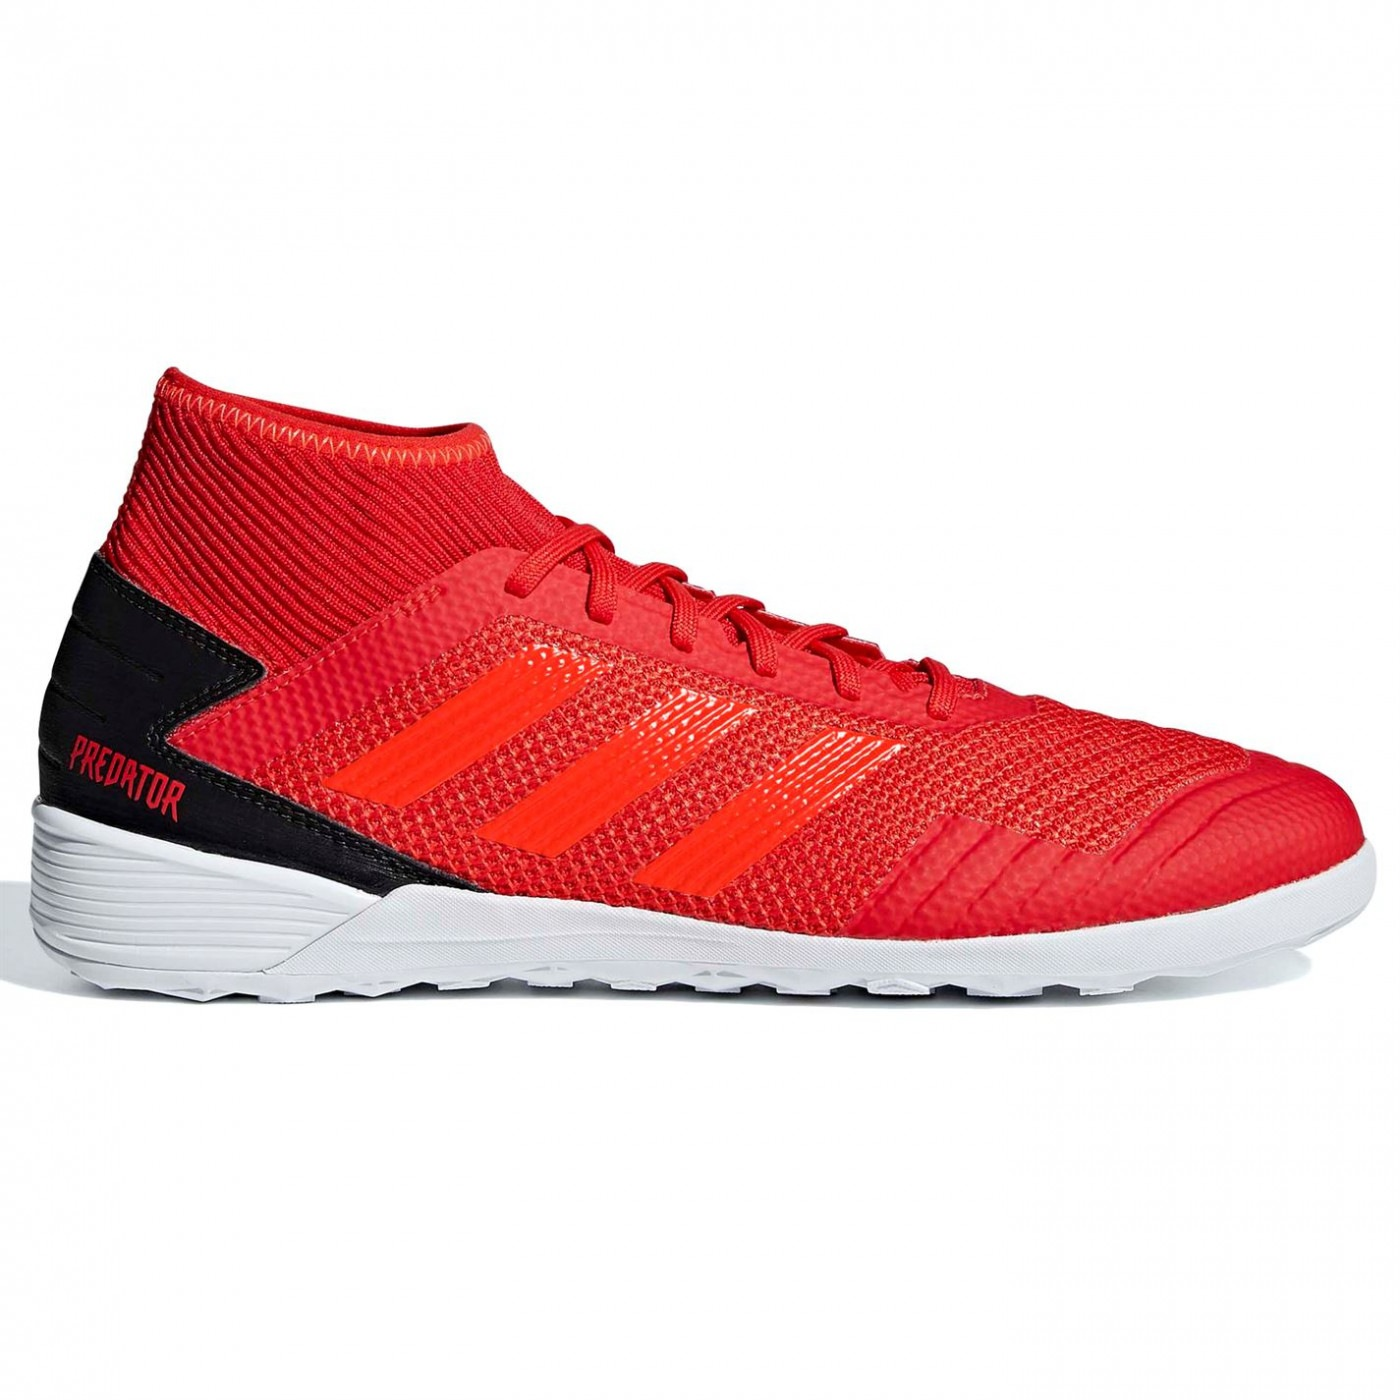 Adidas Predator 19.3 Mens Indoor Football Trainers